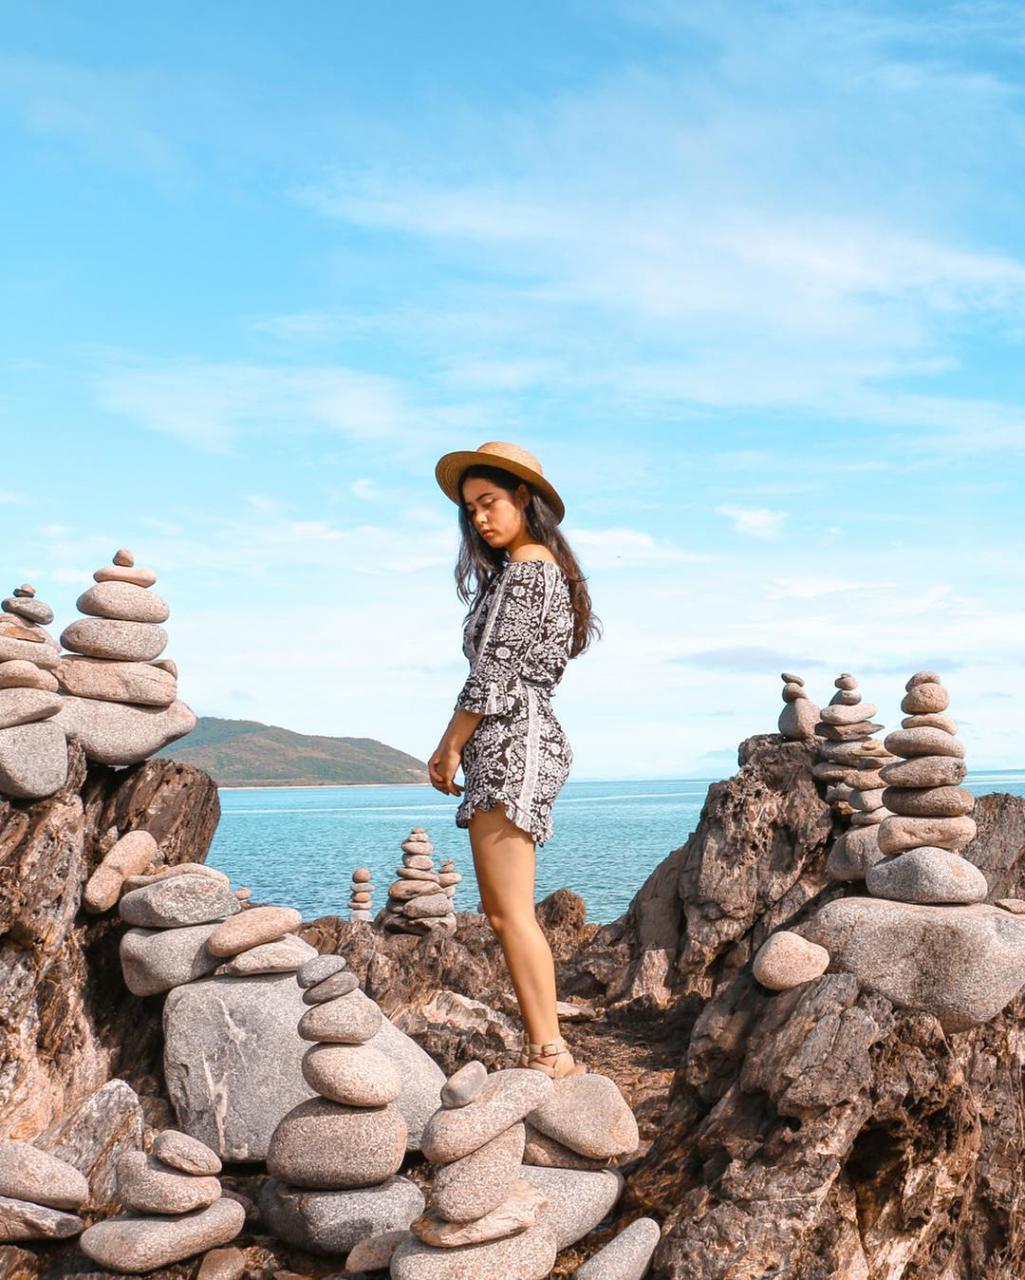 Australia and New Zealand Photogenic Nature Spots Cairns Gatz Balancing Rocks